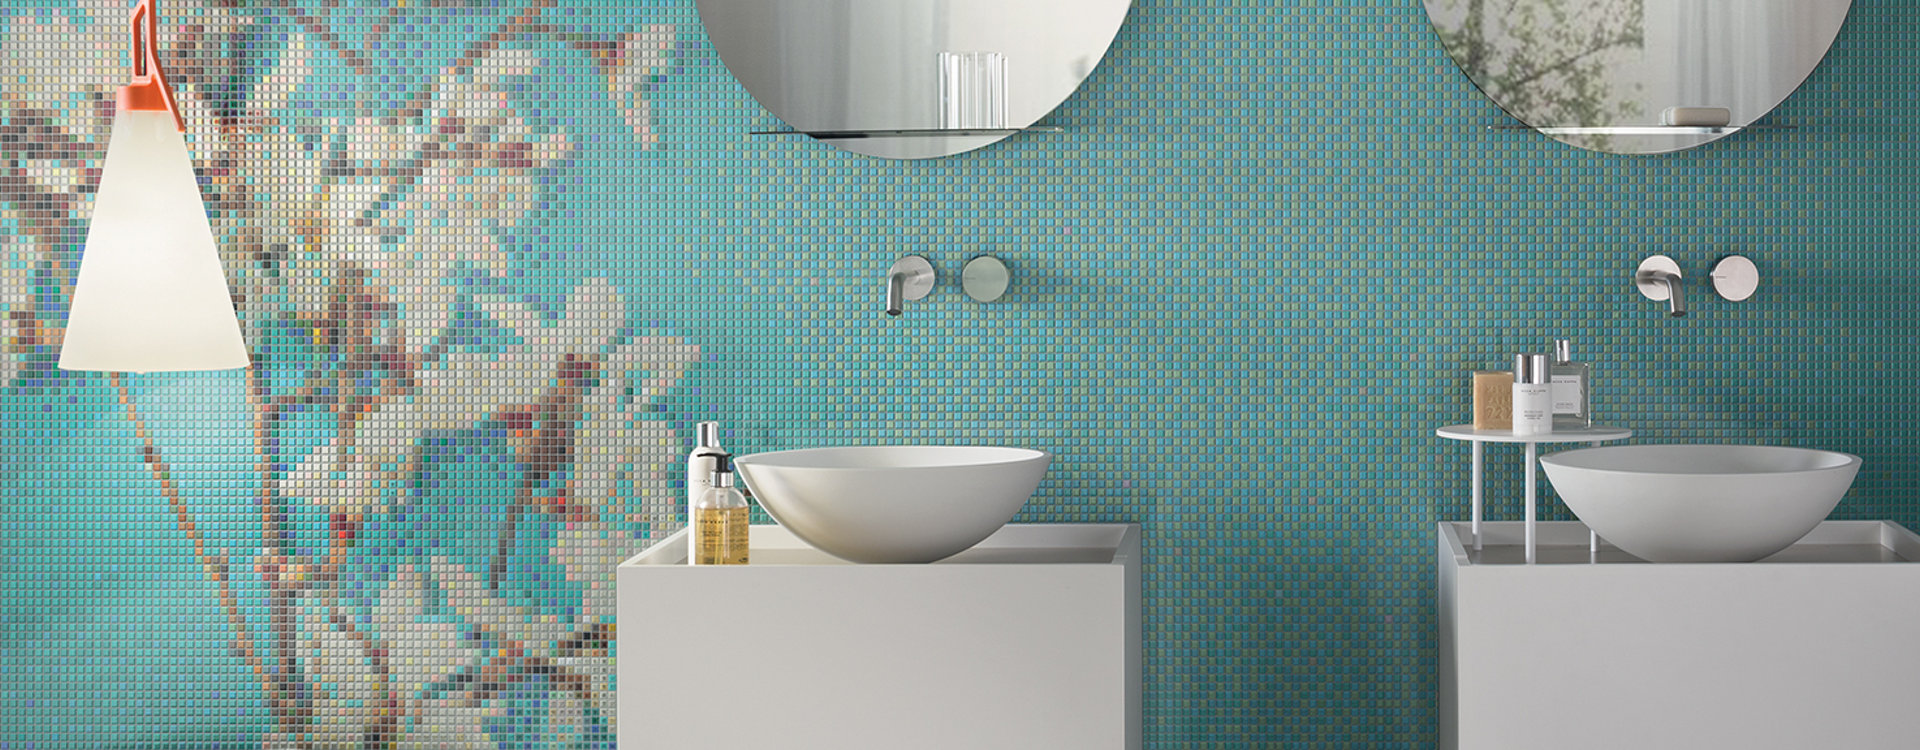 ceramic mosaic tiles, Appiani ceramic mosaics.